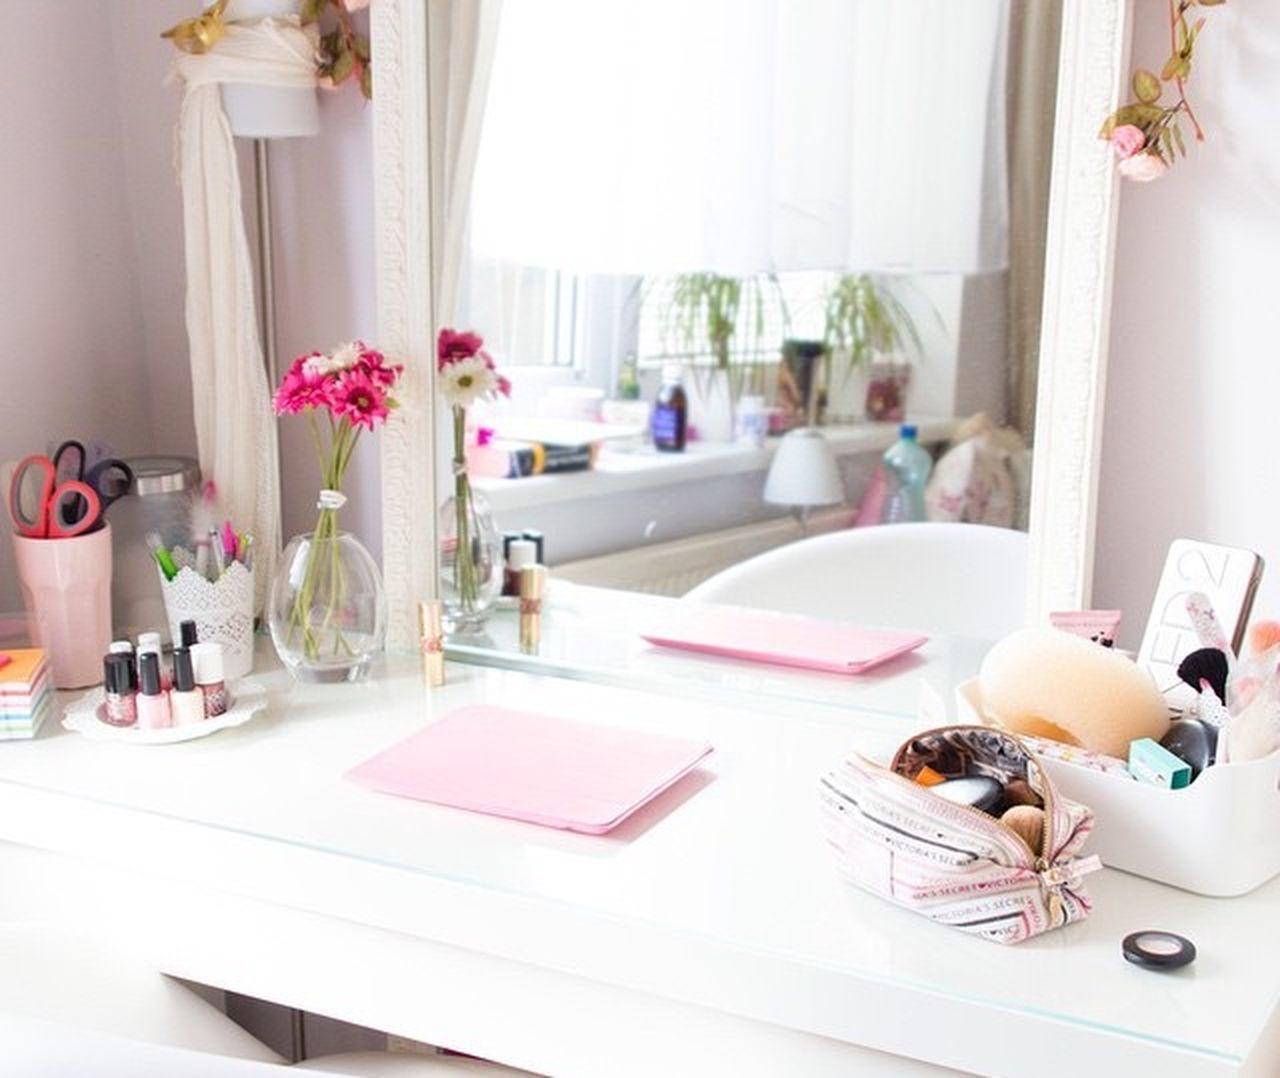 Room Roomtour Niceroom Popularphoto OpenEdit Relaxing Popular Loveforlove Cute Cheese Healthy Good Morning